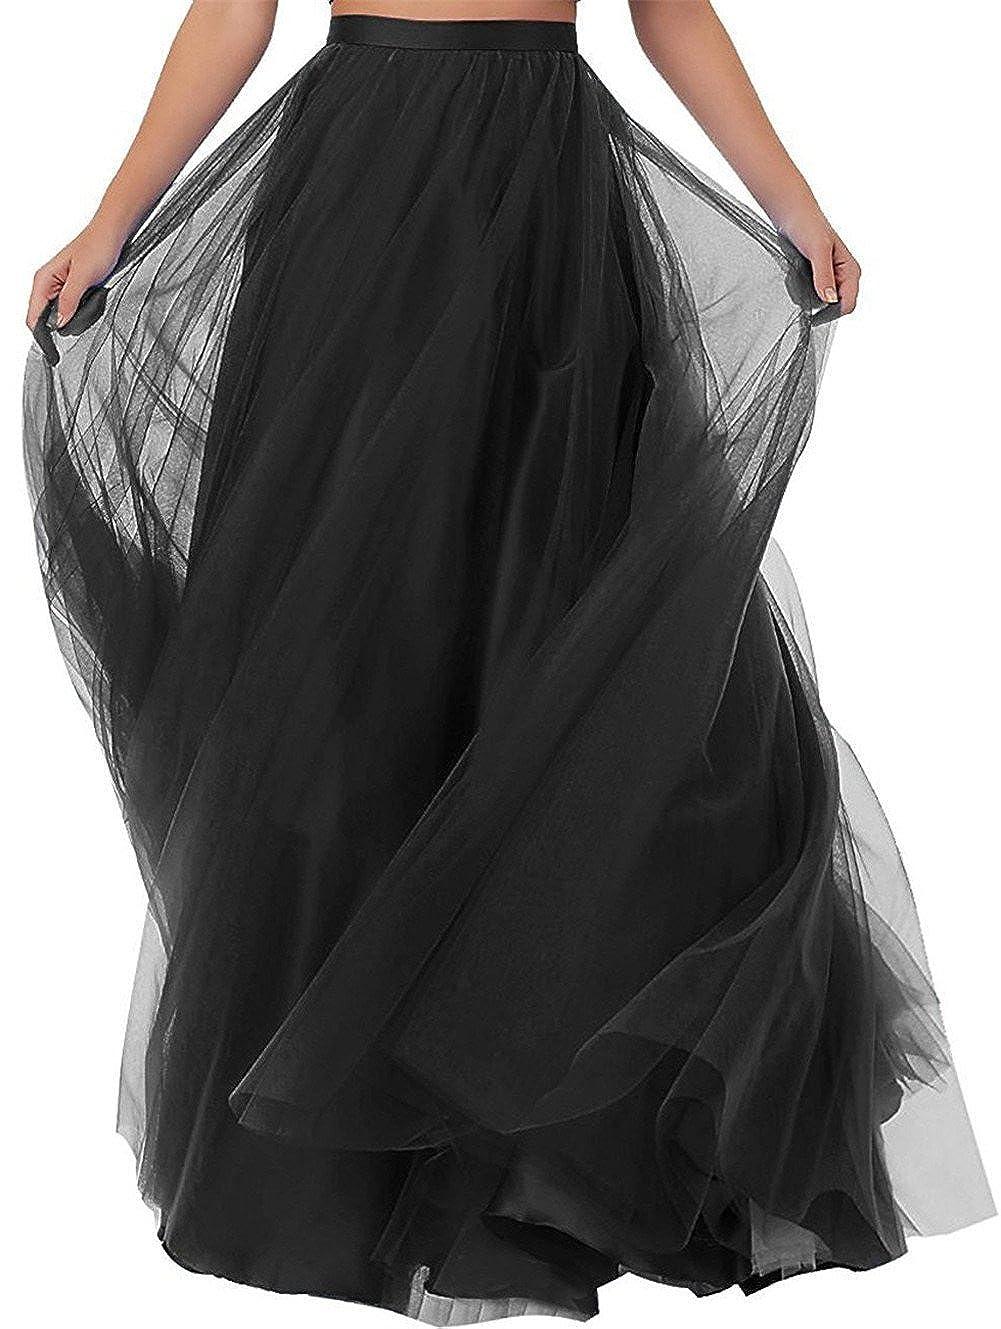 Damen Lange T/üllrock Bodenlang Rock A-Line Maxi hohe tailliertes f/ür Hochzeitsfeier